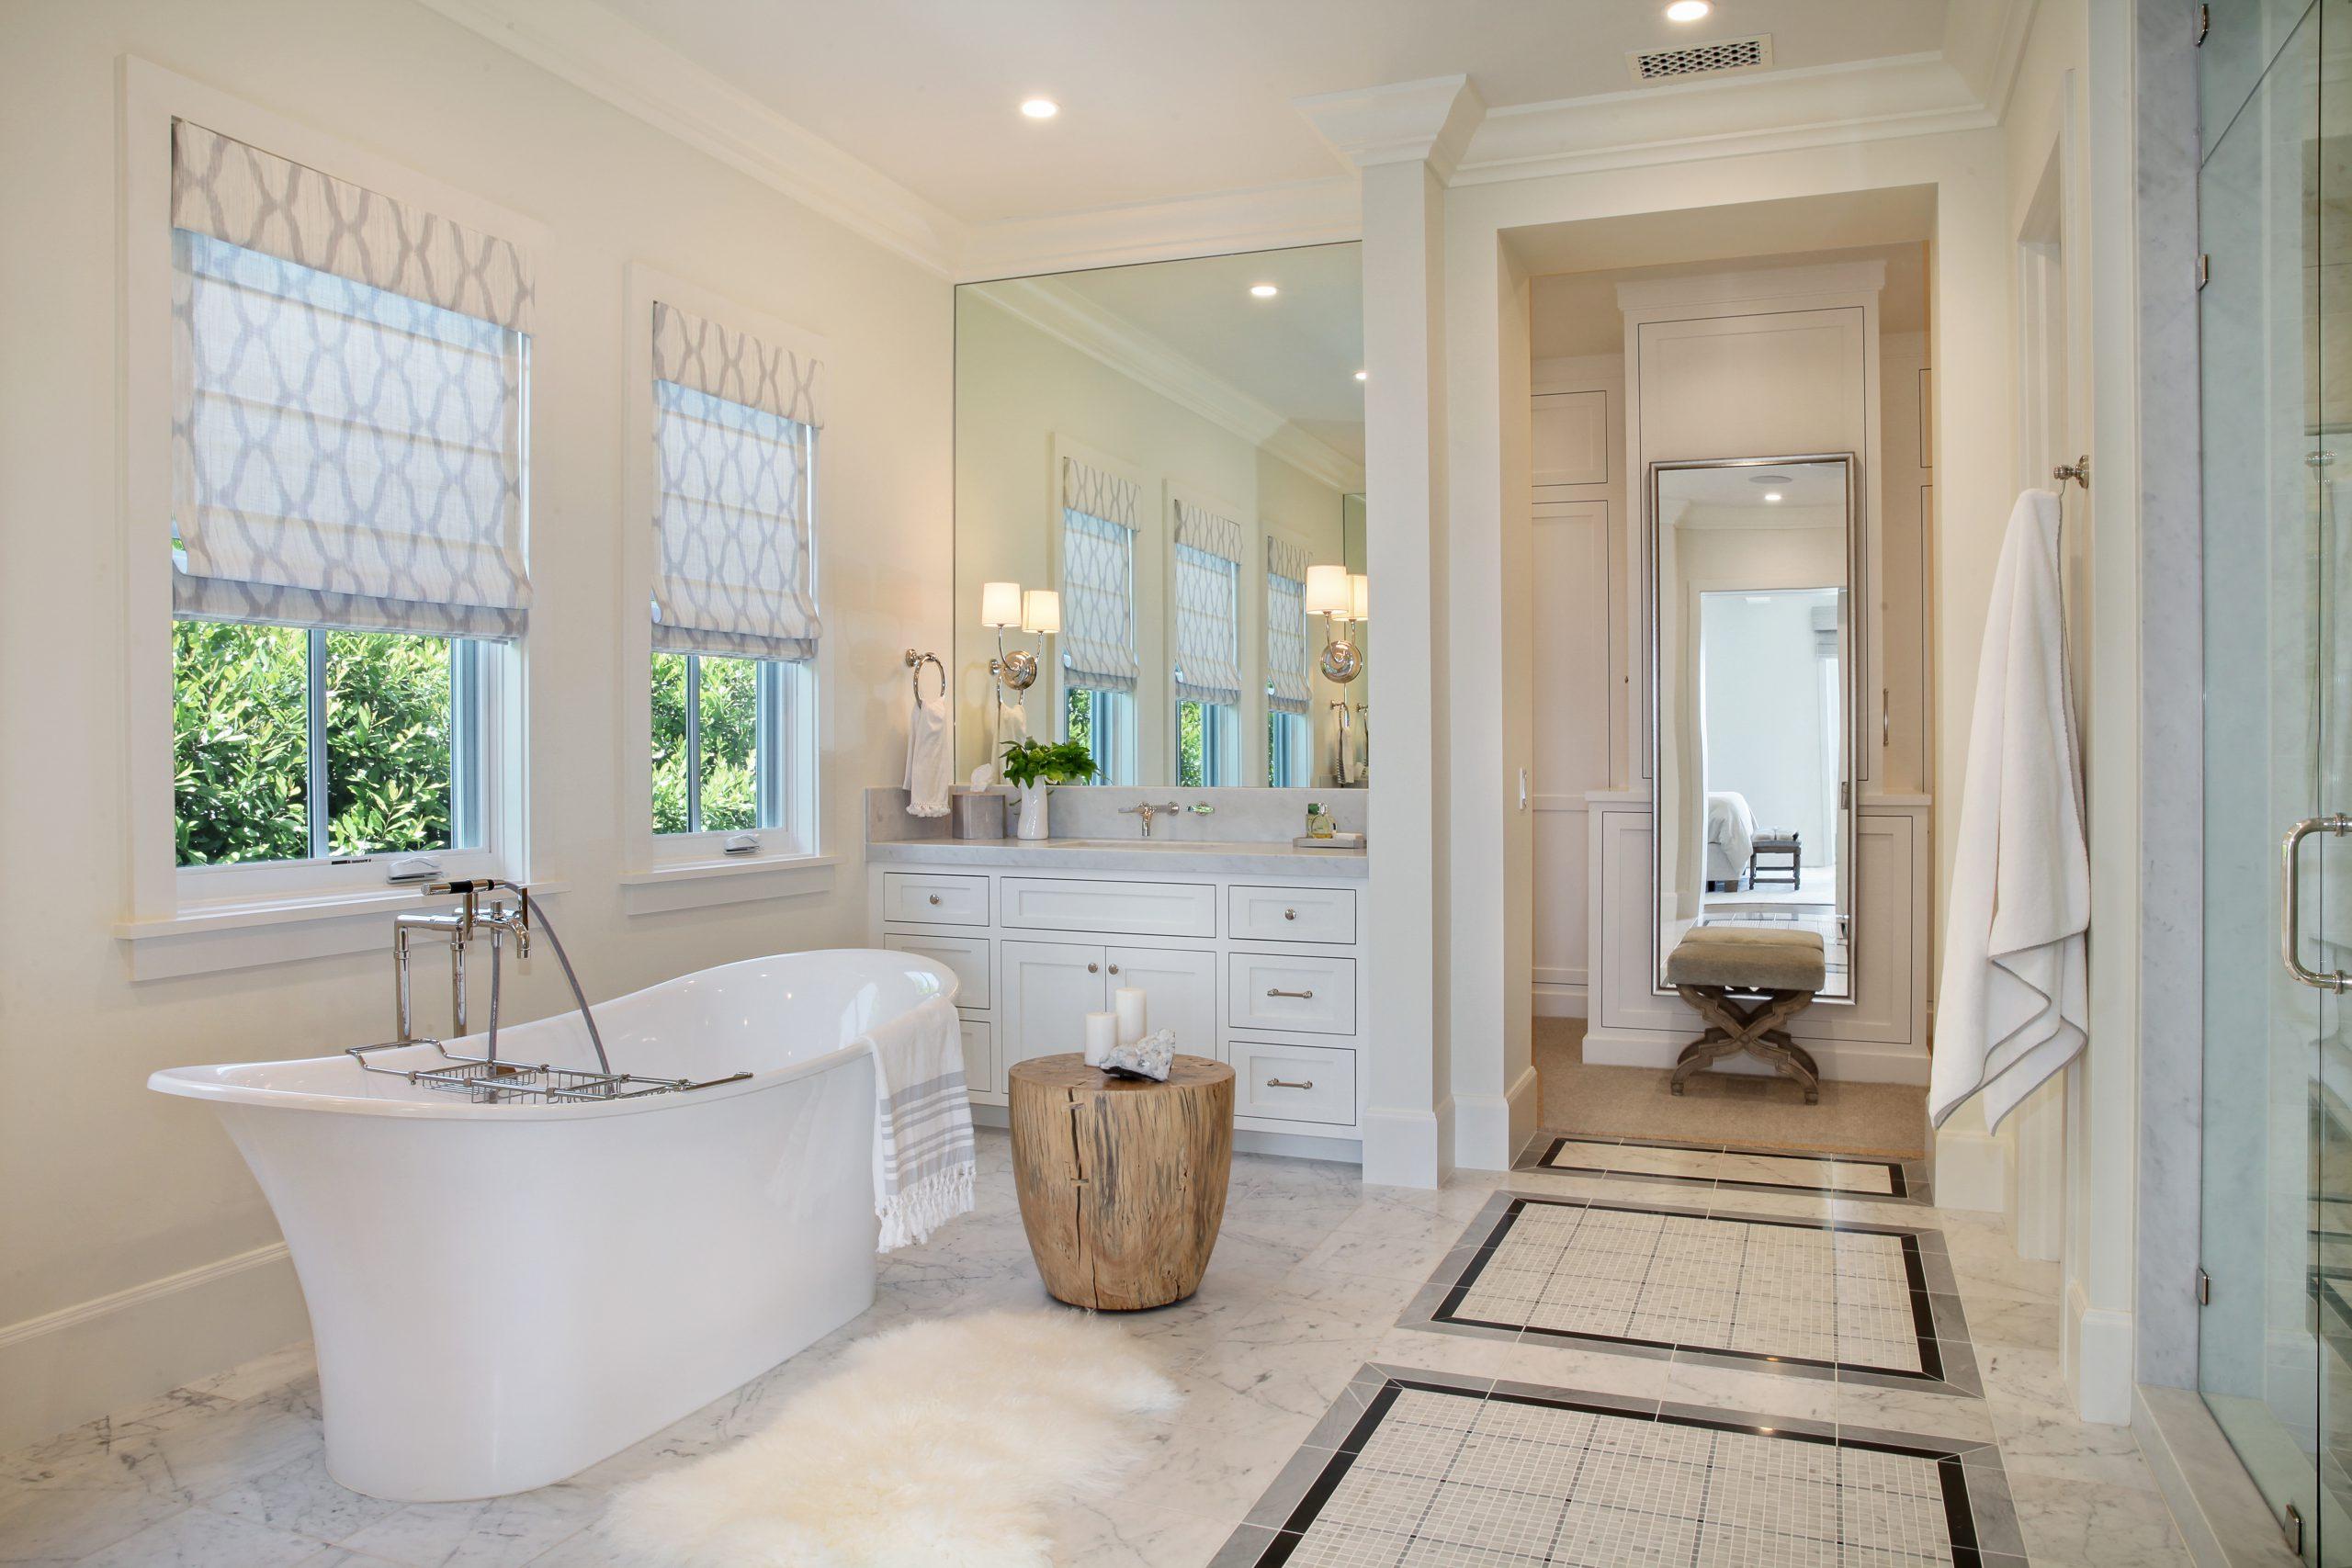 bathtub-refinishing-chicago-countertop-resurfacing-chicago